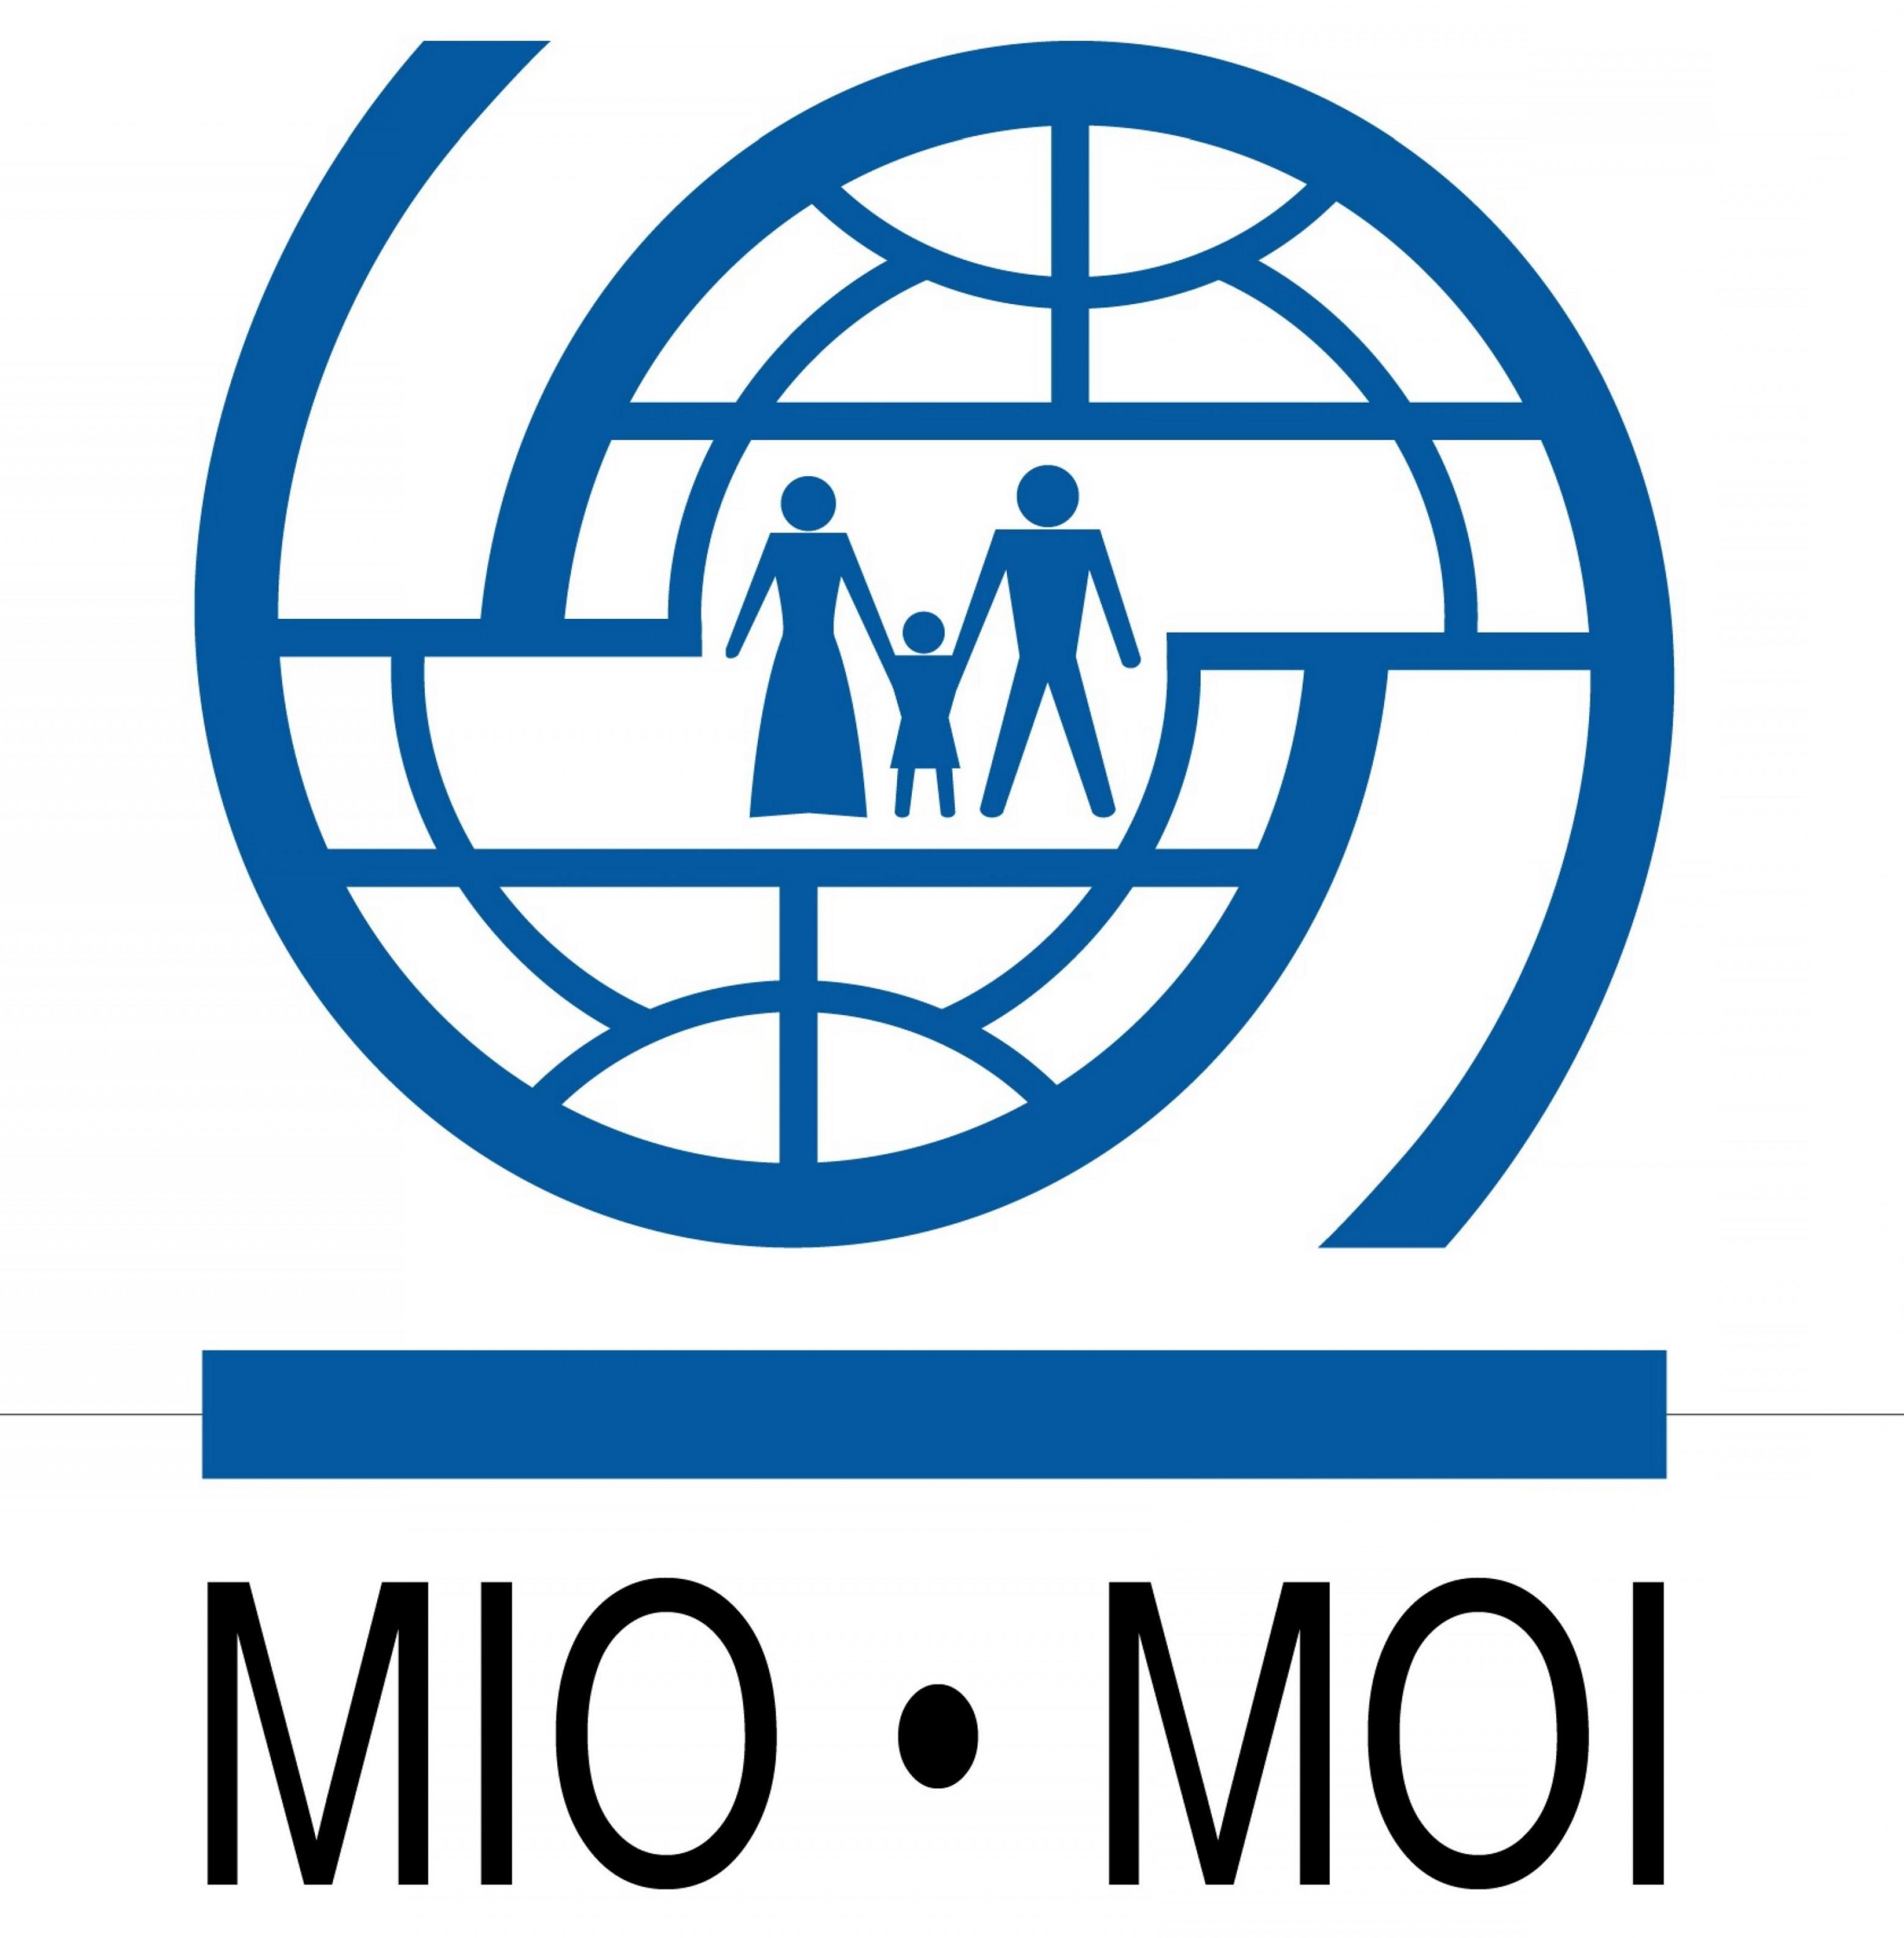 Iom International Organization For Migration Logo Pdf.